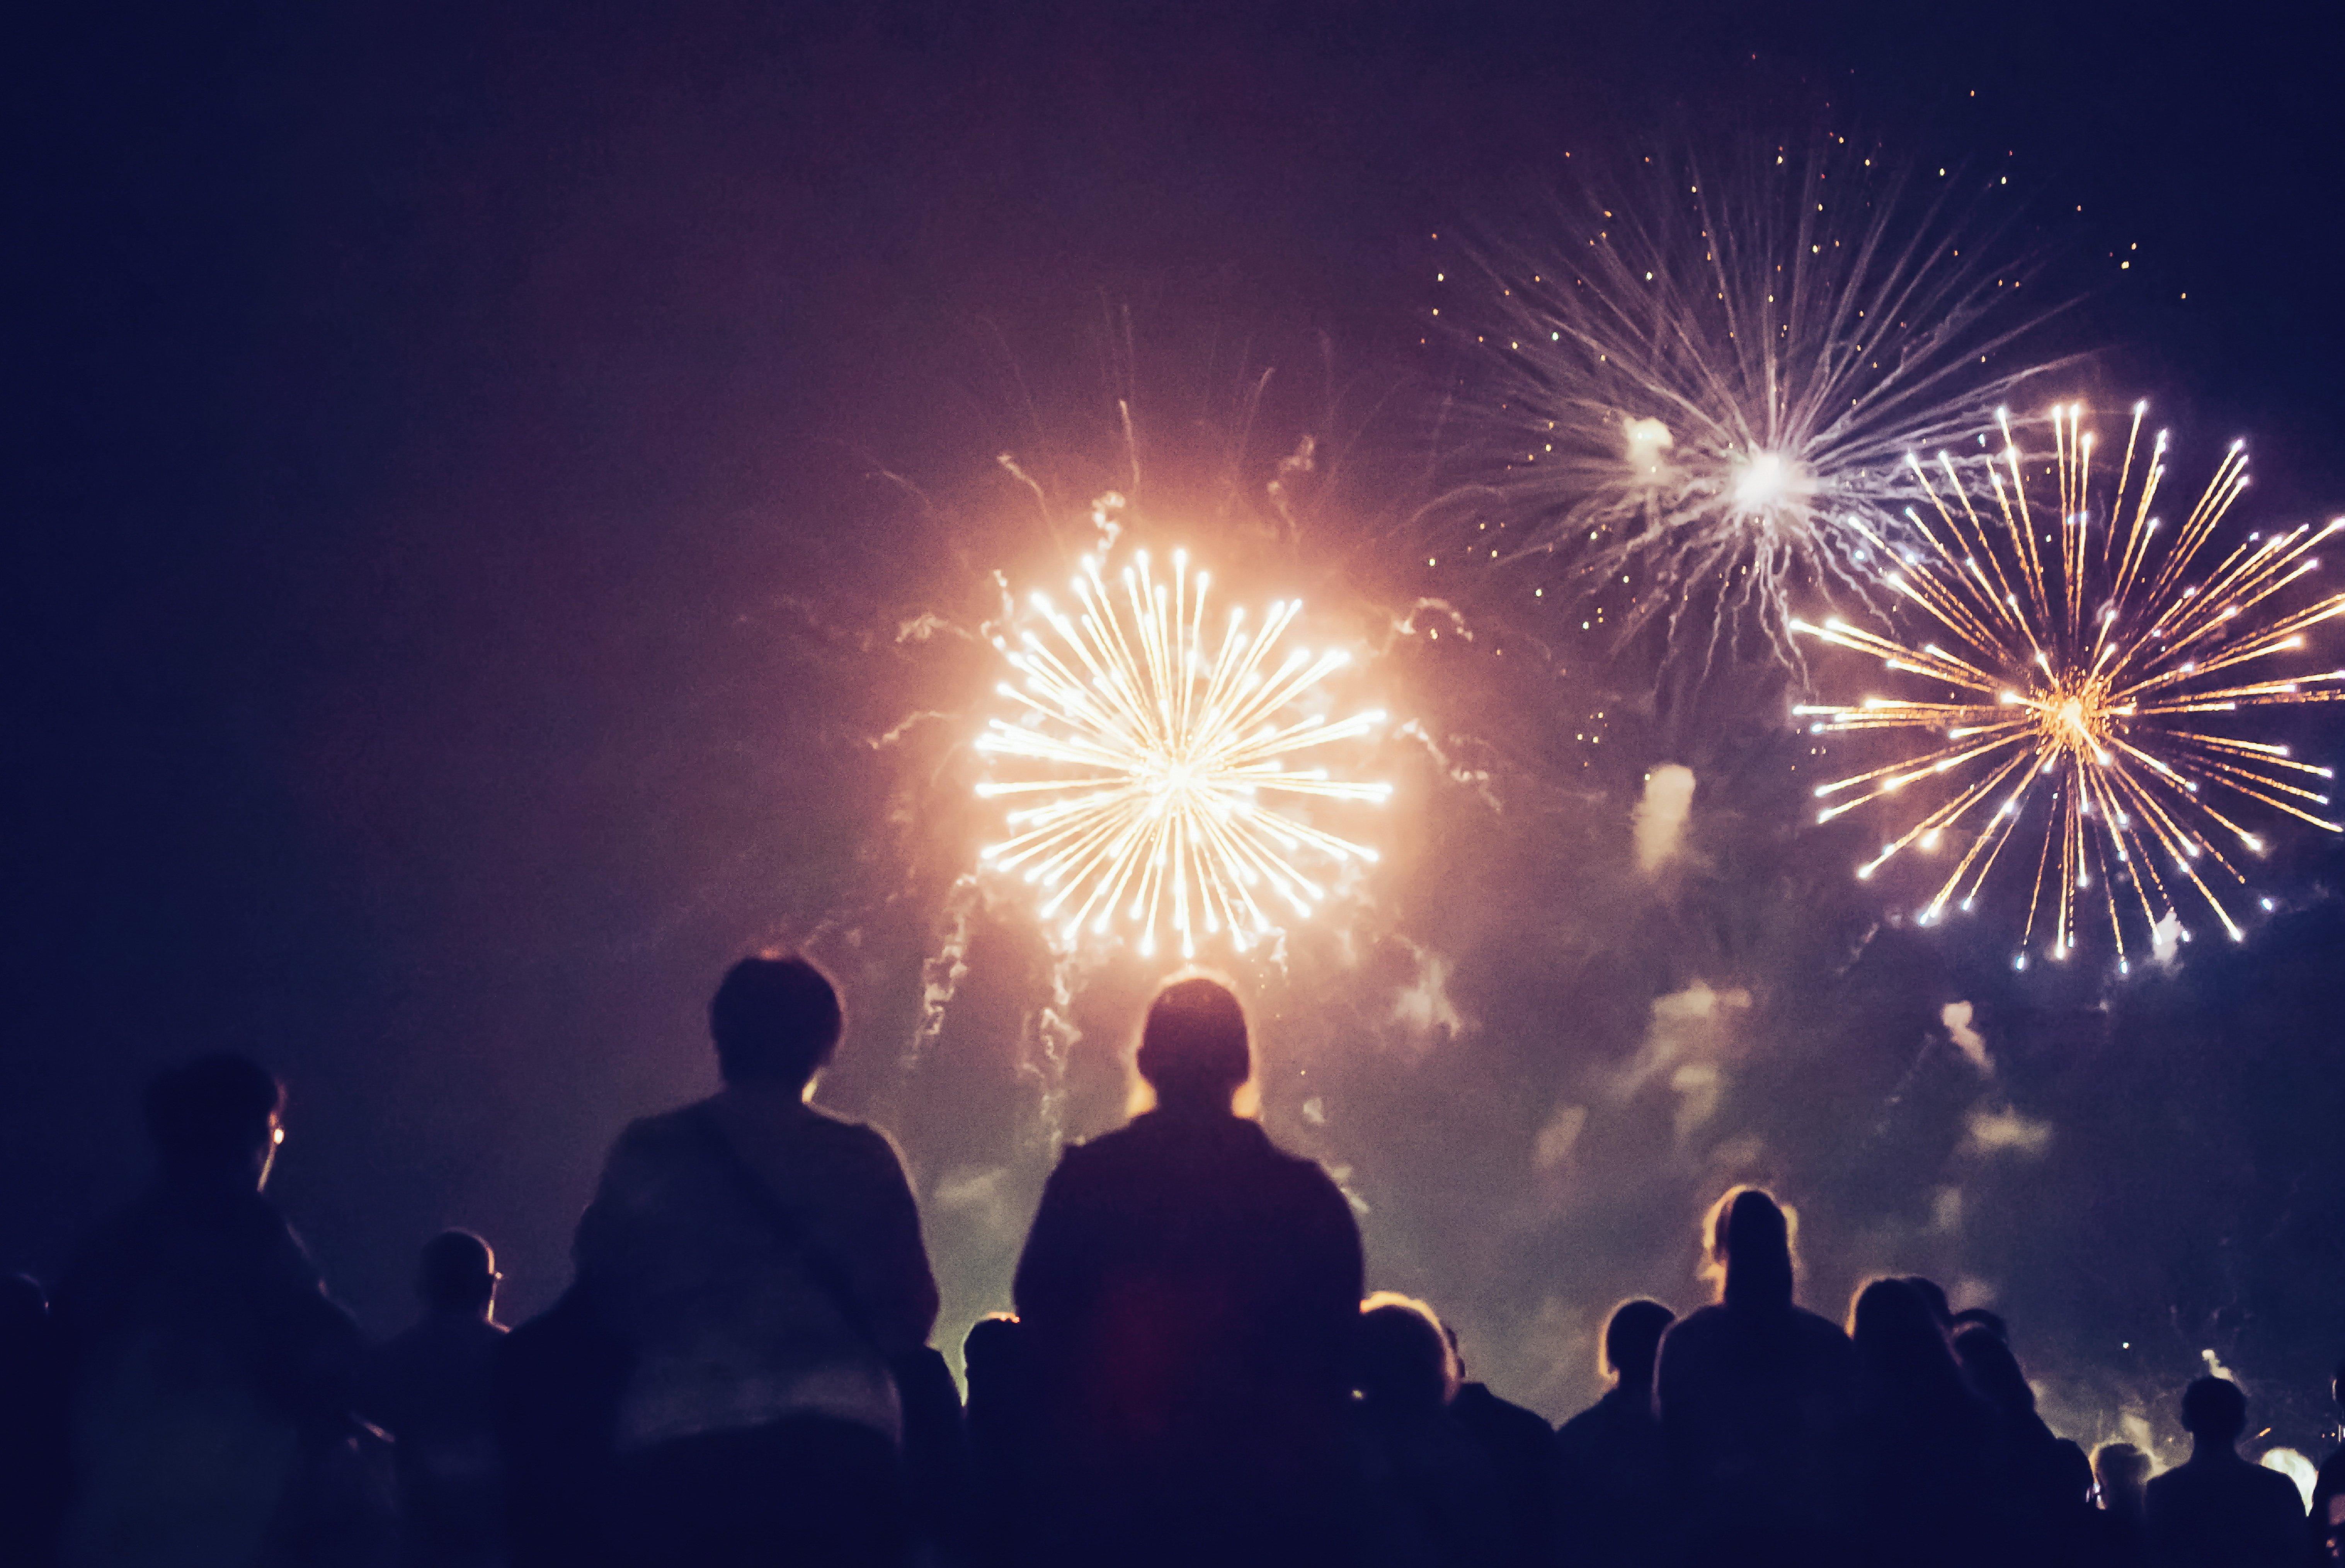 spectators viewing fireworks